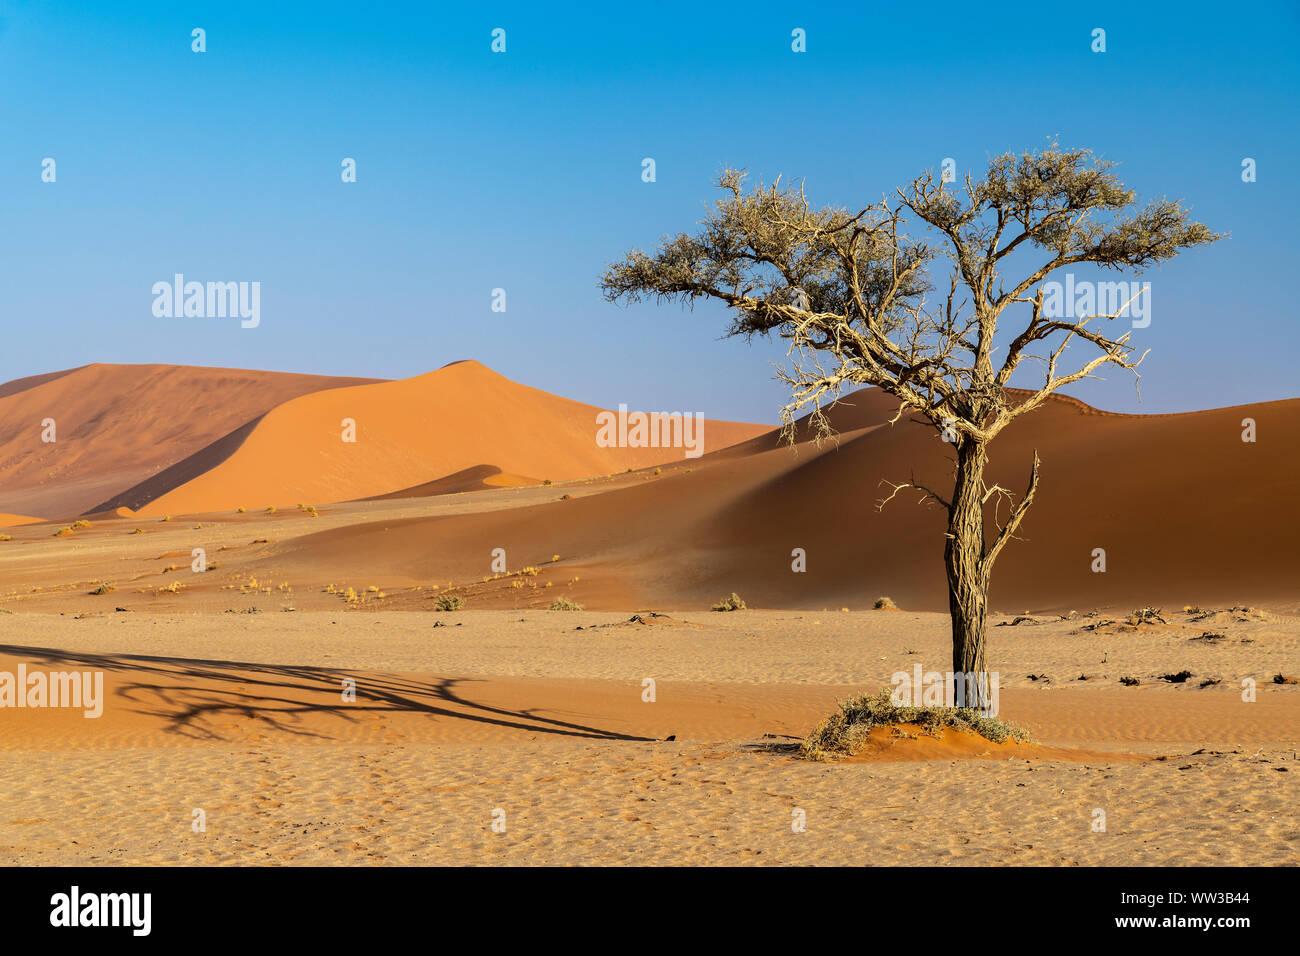 Dunes de sable, Sossusvlei, Namib-Naukluft National Park, Sesriem, Namibie Banque D'Images